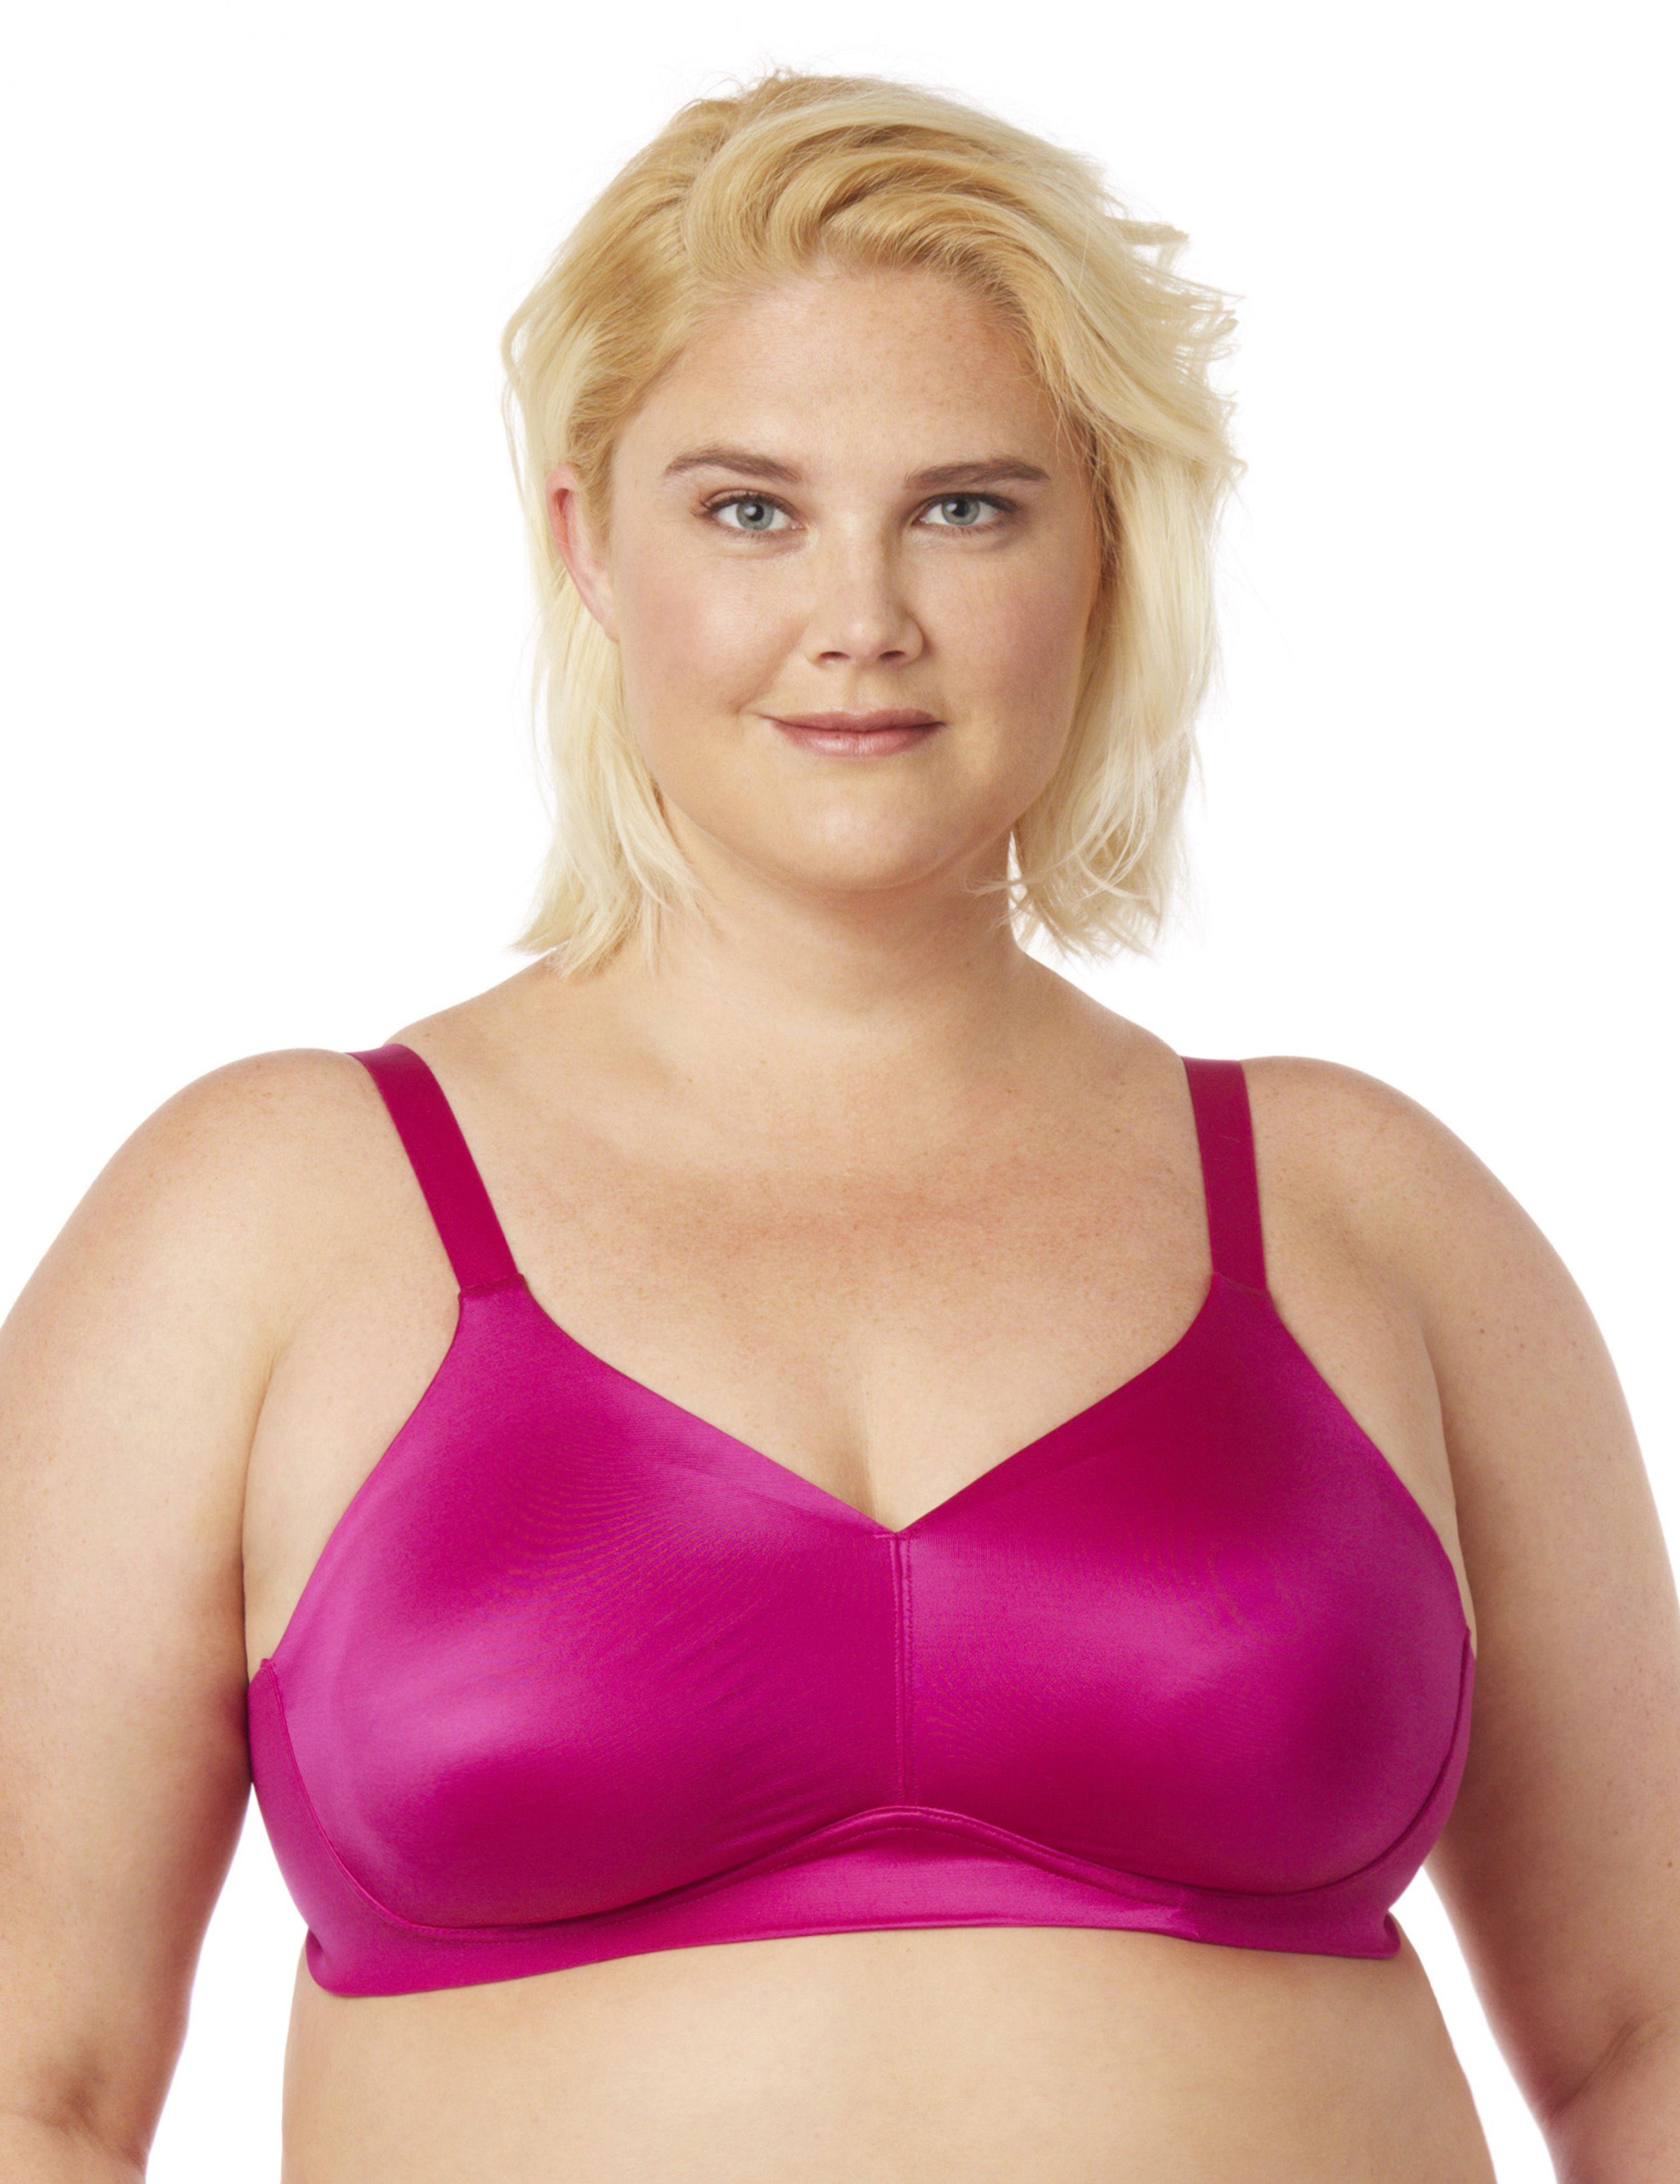 Plus Size Bras - Best Bra Styles For Plus Size Women | Catherines